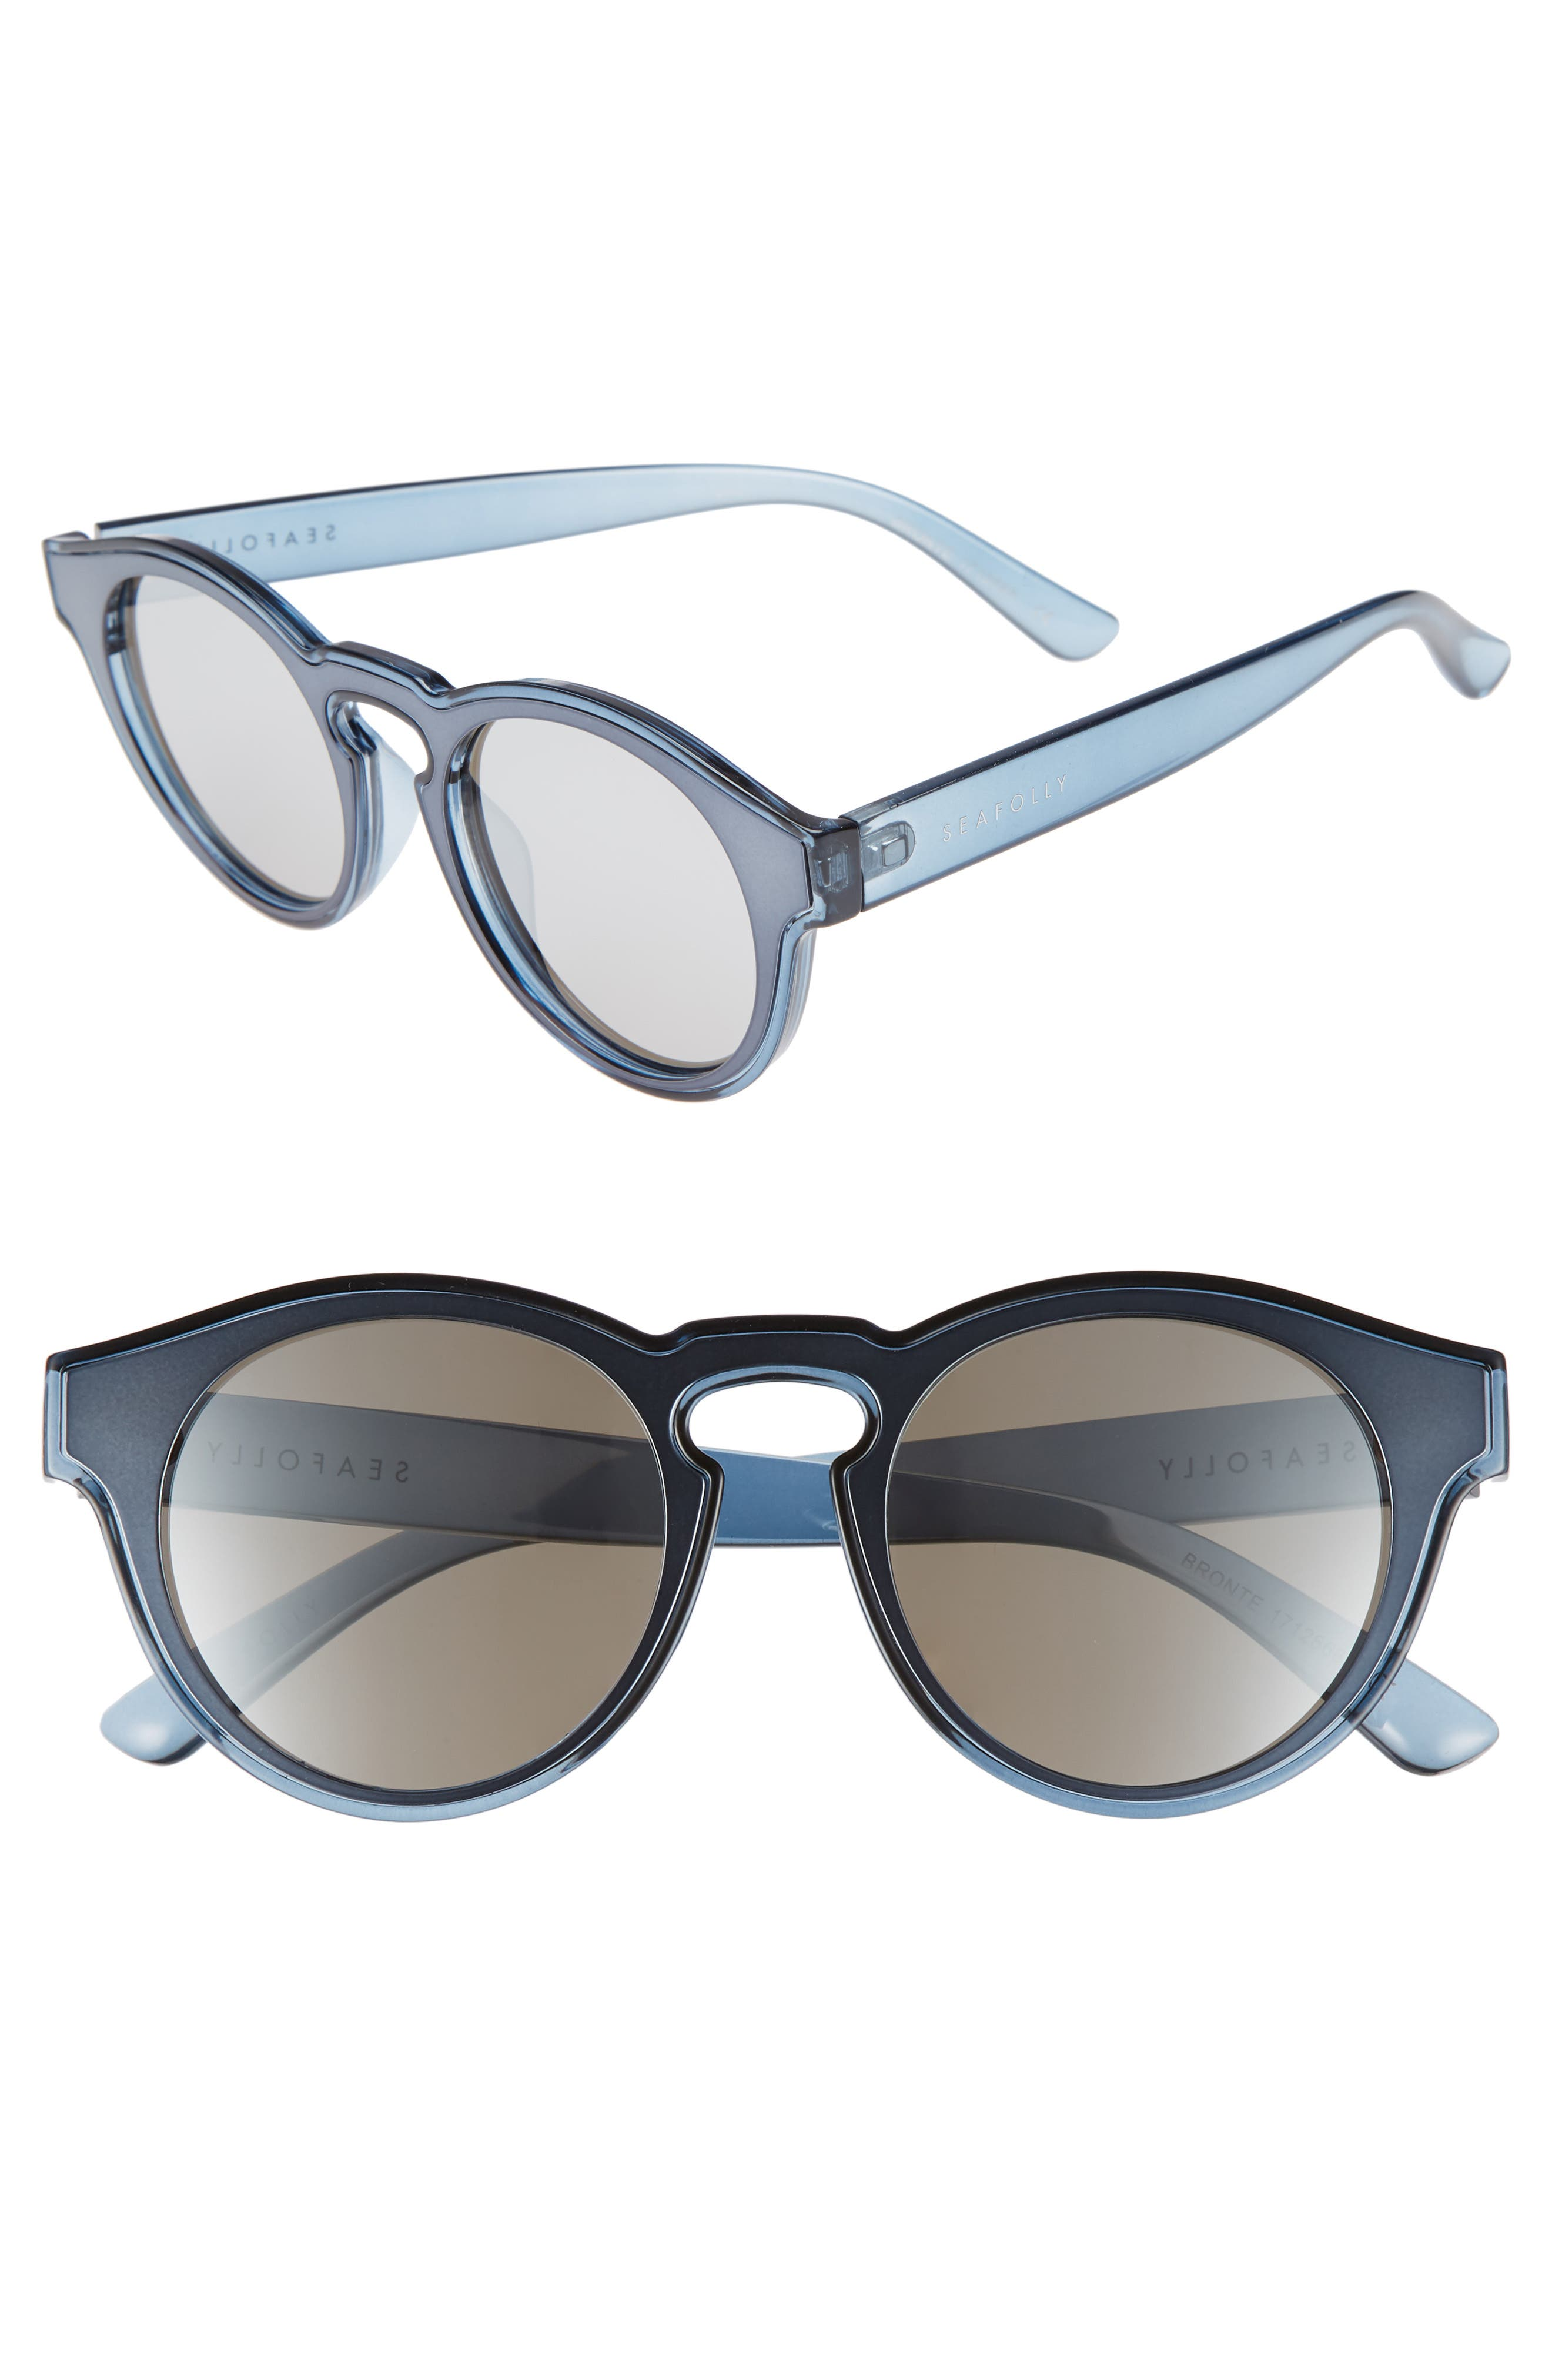 Seafolly Bronte 50mm Sunglasses